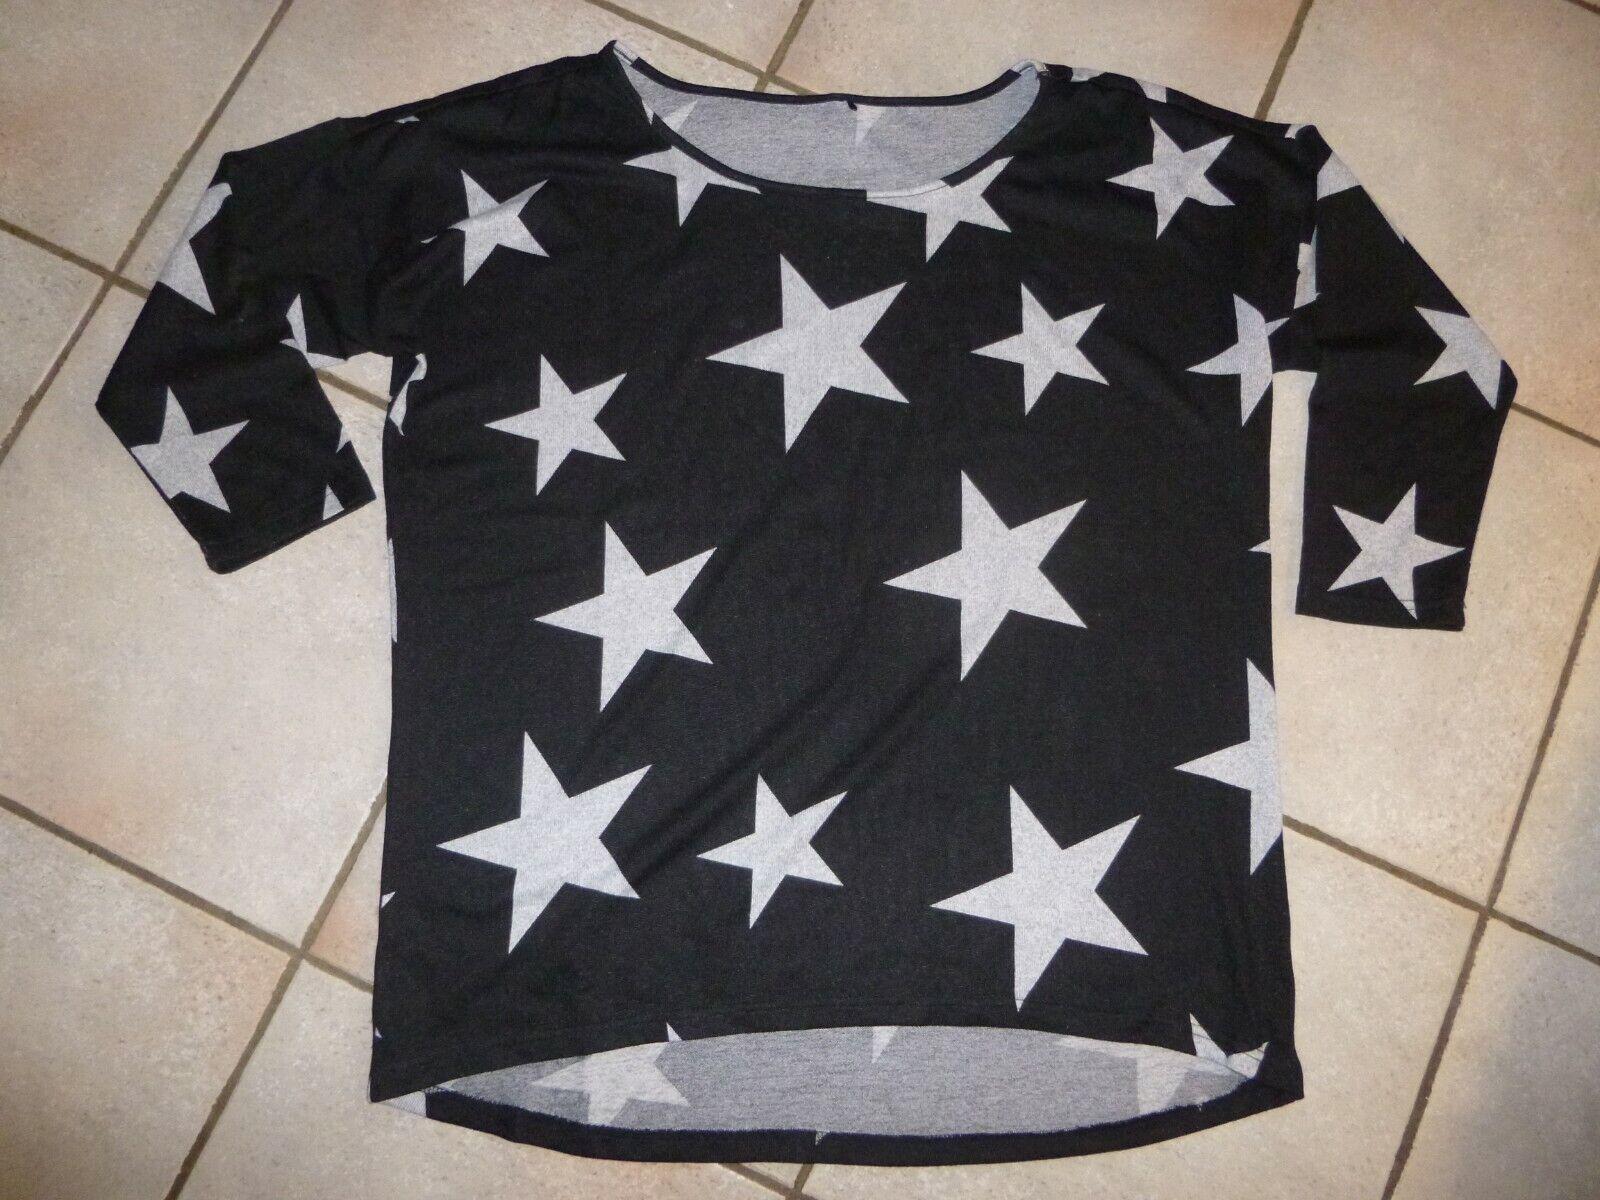 Damen Pullover Sterne, Gr. XL, 7/8-Ärmel, schwarz grau, hinten länger